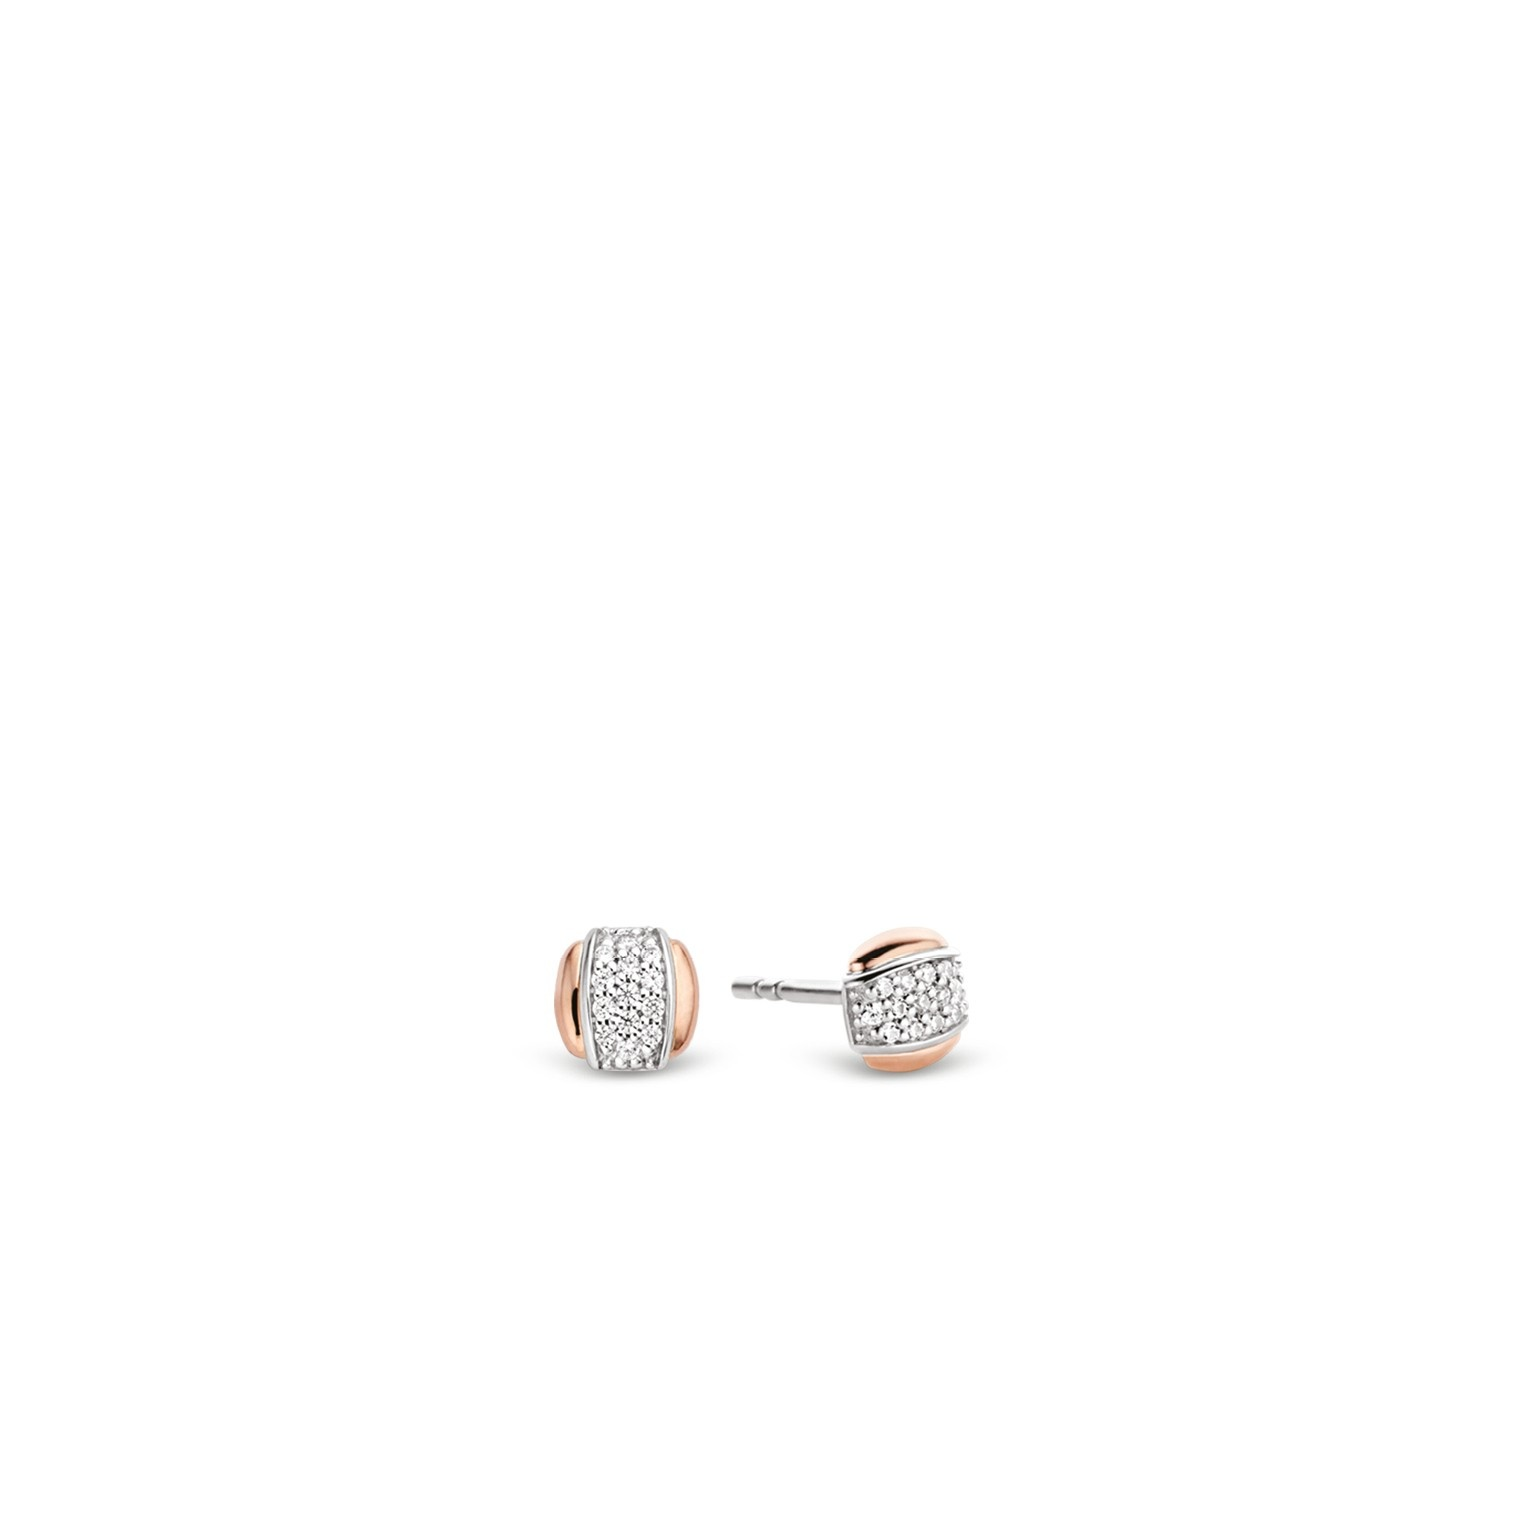 TI SENTO - Milano Earrings 7799ZR-1